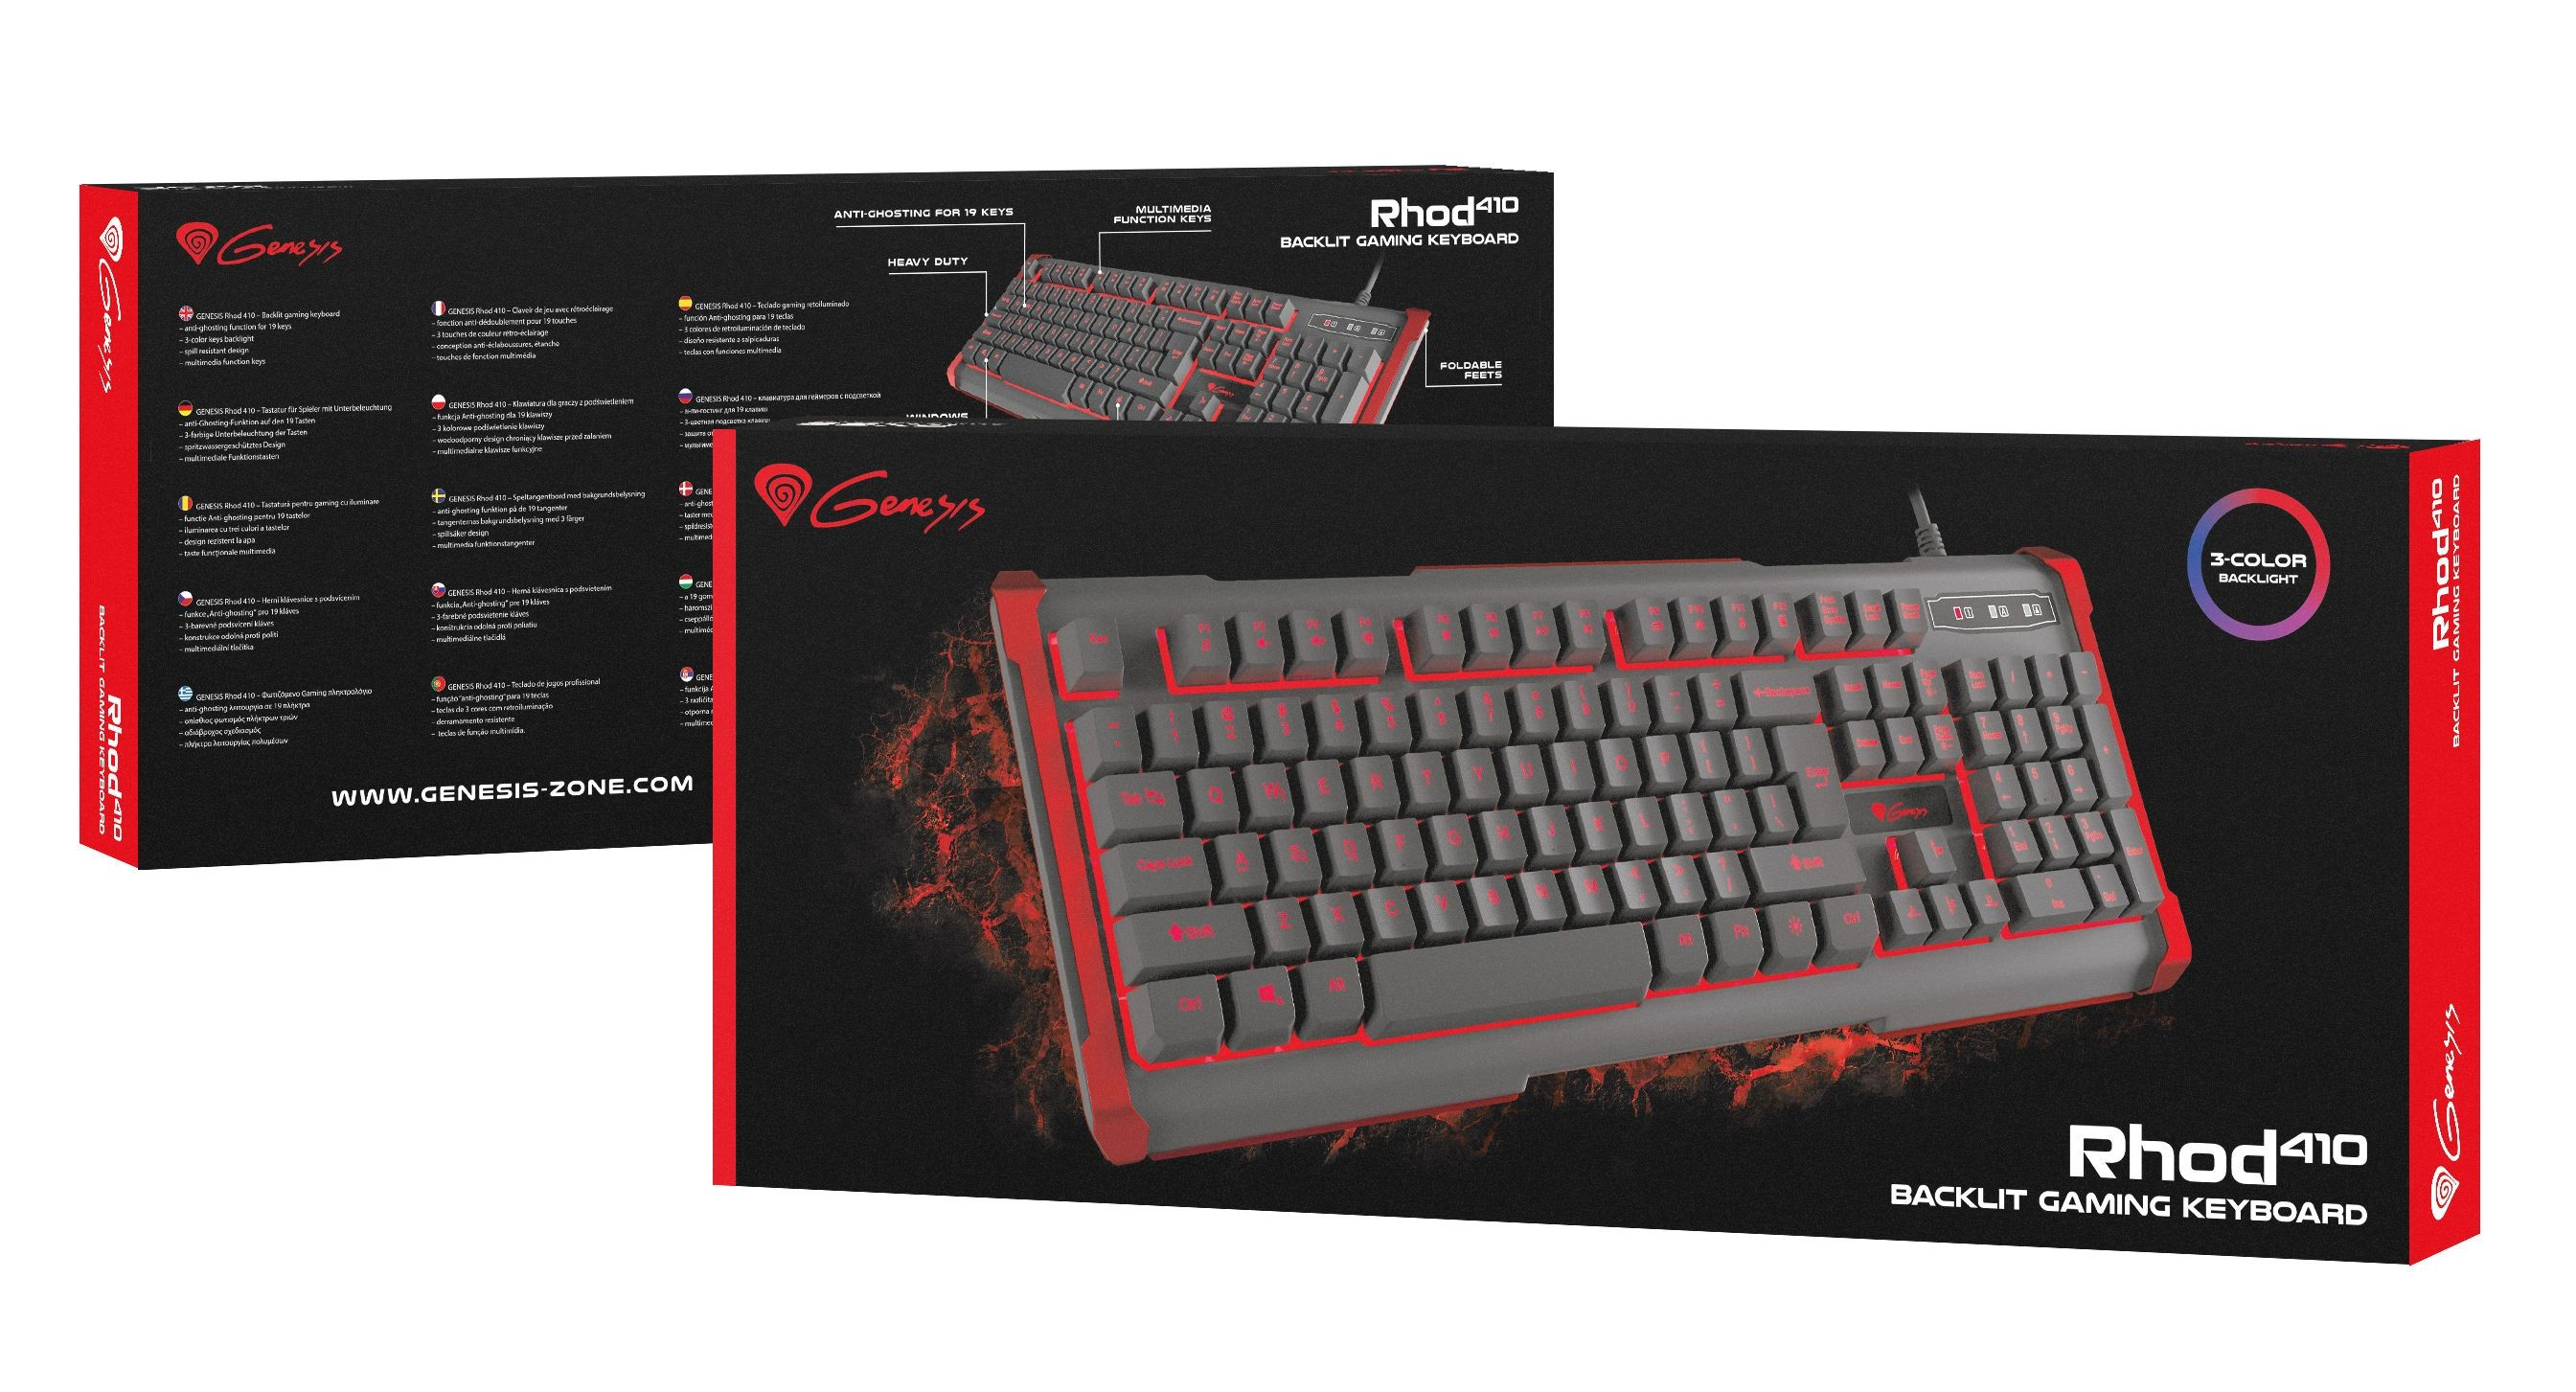 Гейминг клавиатура Genesis - Rhod 410, Us Layout - 4